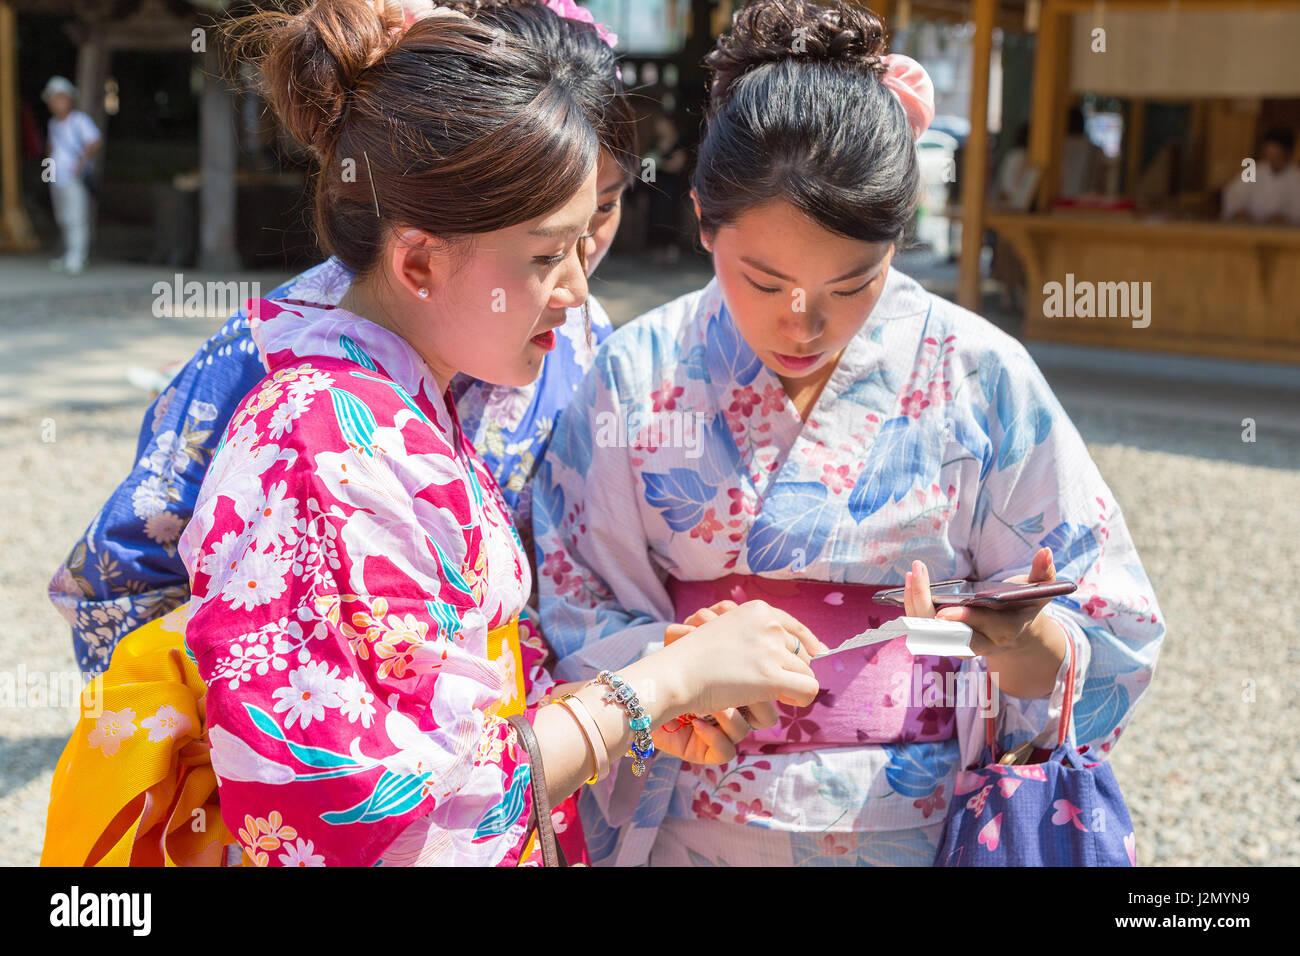 kawagoe women More from my site fellatio japan – mai araki & yui kawagoe blowjobs – 荒木まい & 川越ゆい フェラチオ legs japan – mai araki, yui kawagoe double office girl footjob – 荒木まい, 川越ゆい olのw足コキ.